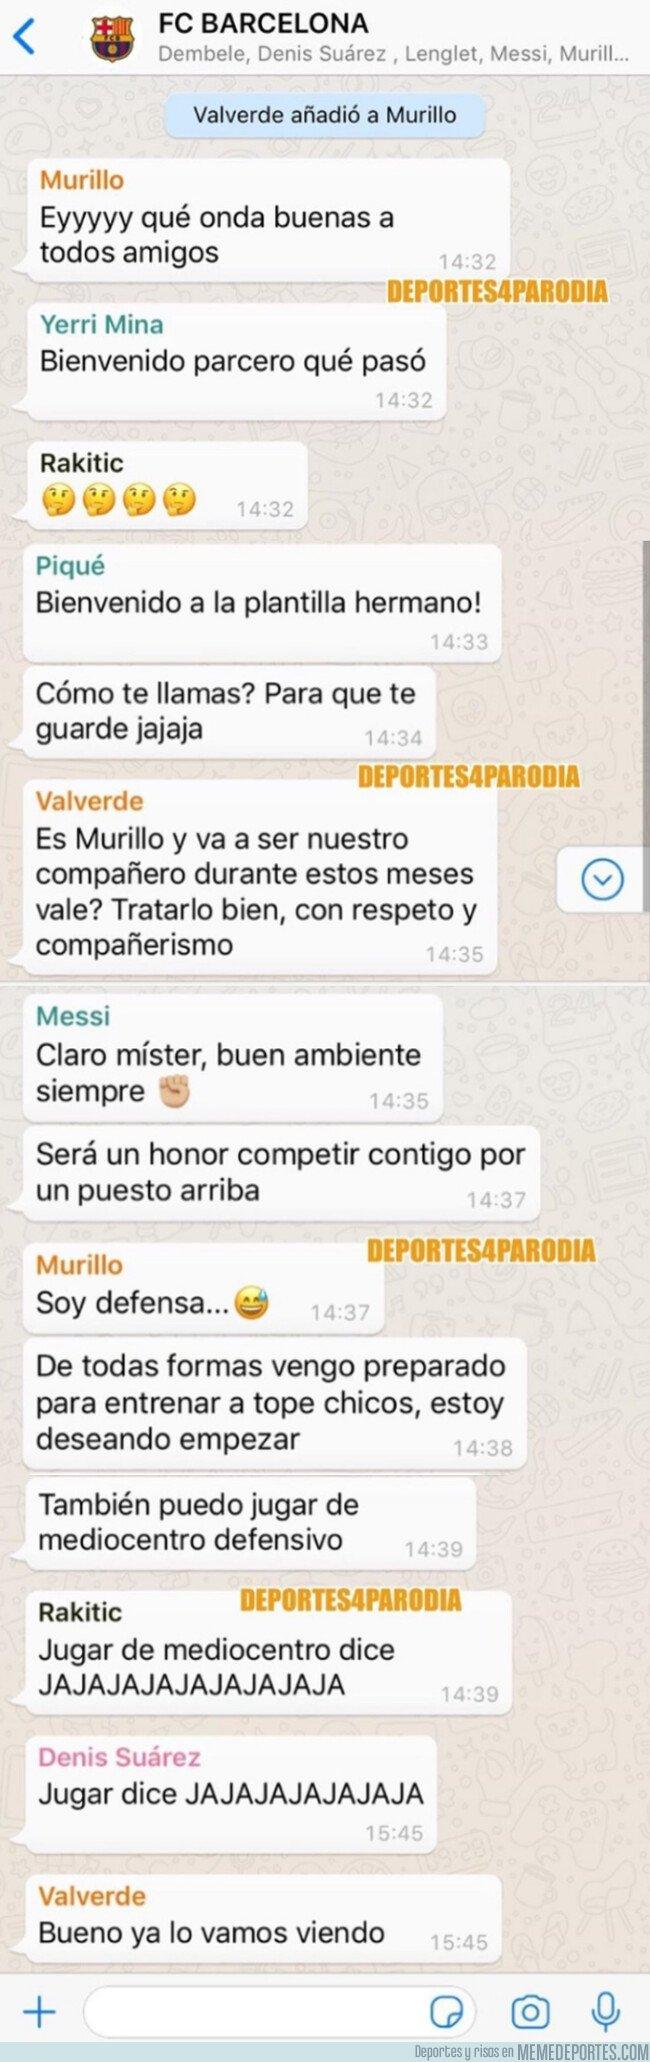 1060131 - Jeison Murillo es añadido al grupo de Whatsapp del Barça, por @deportes4parodia